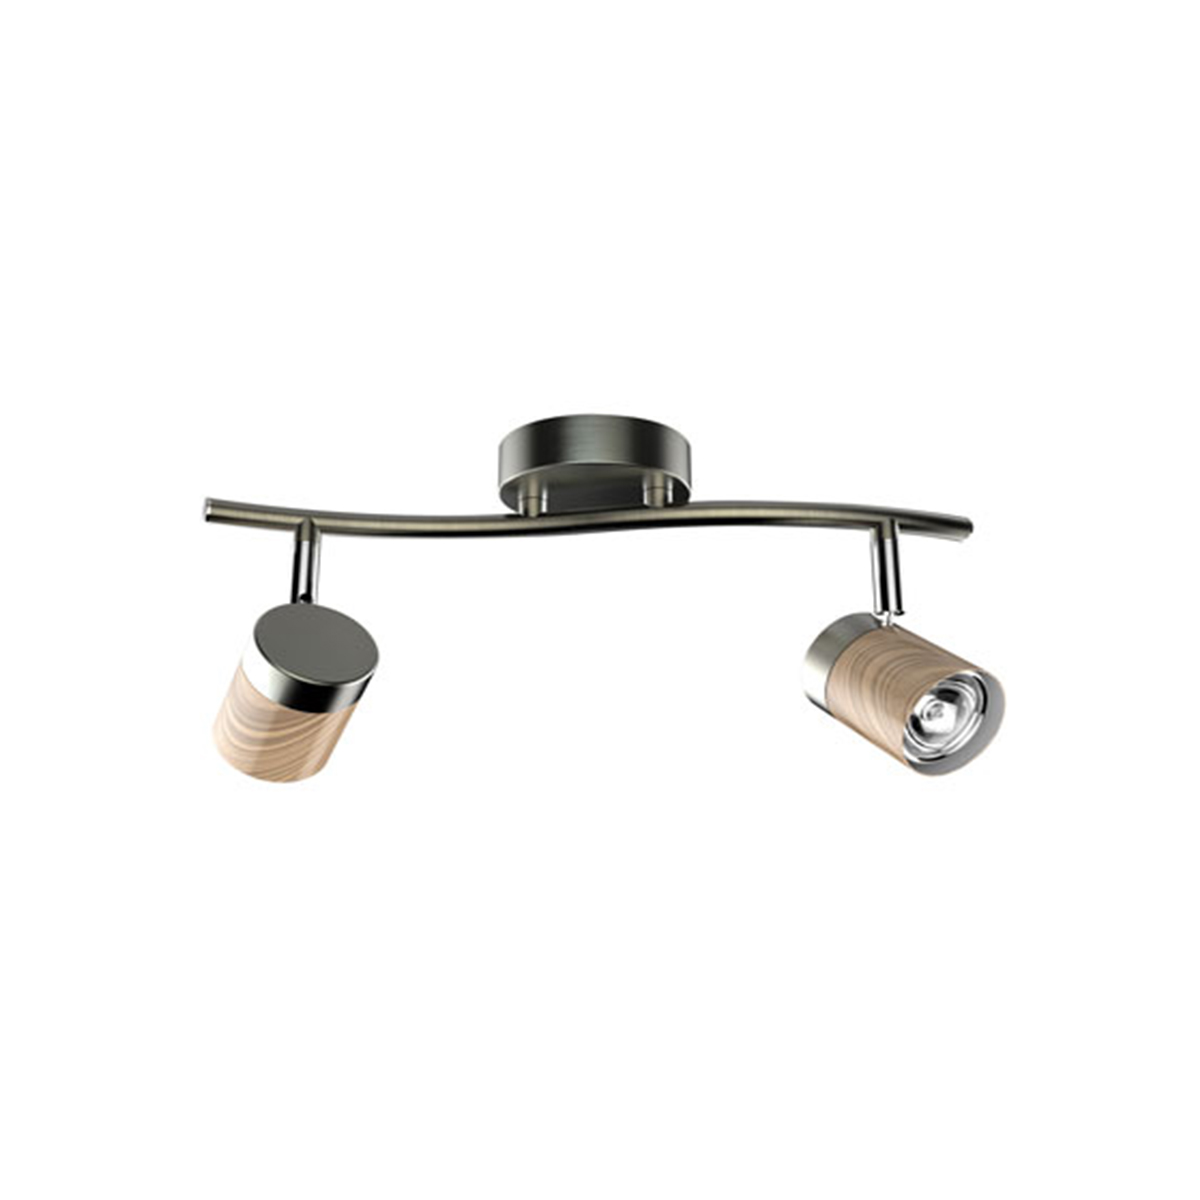 Spot lampa Level/2 6601796